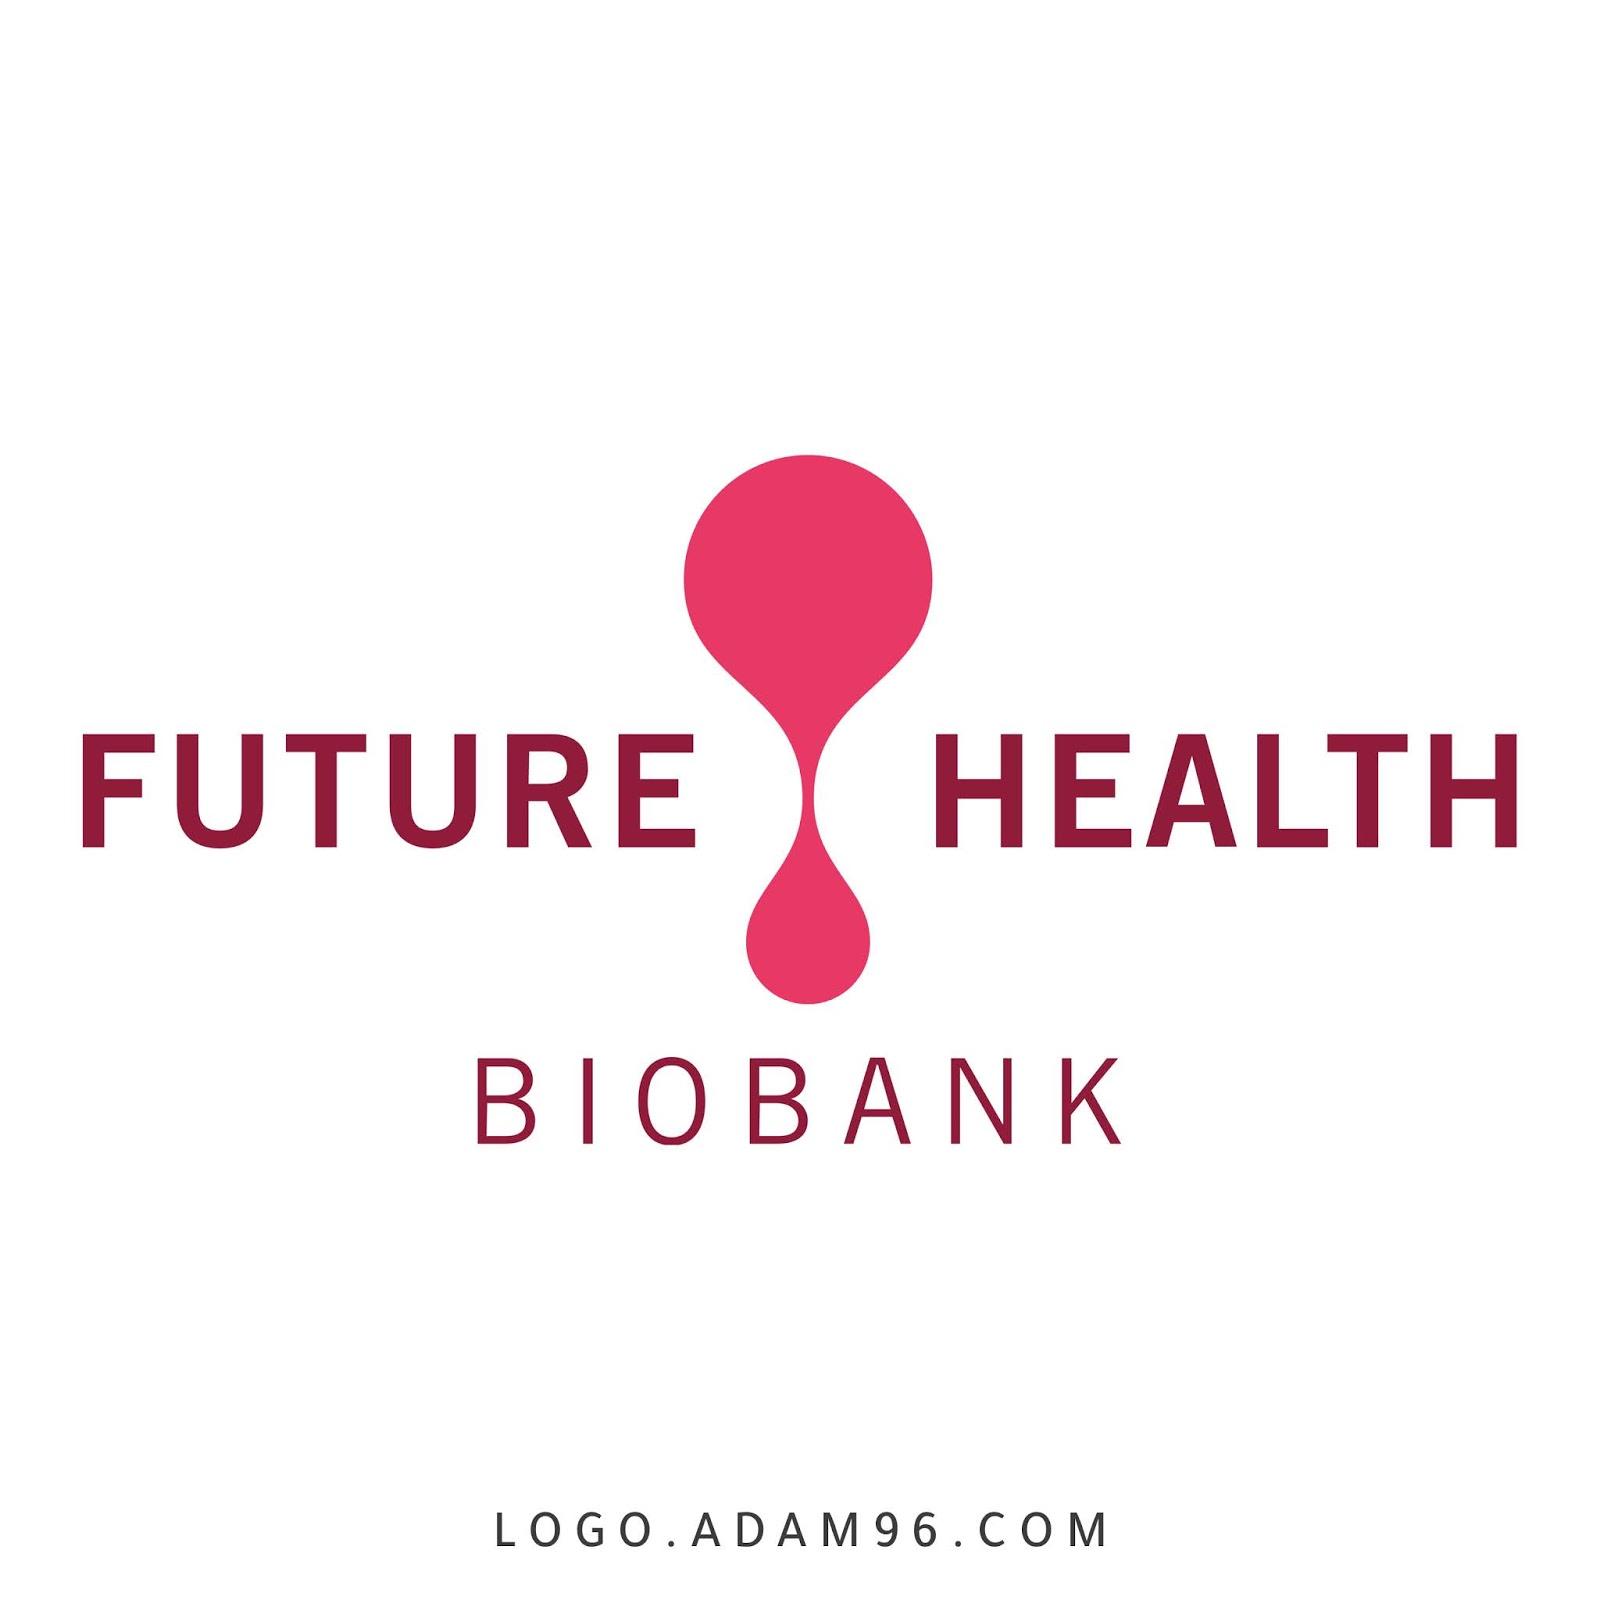 Logo Future Health Biobank high quality Png